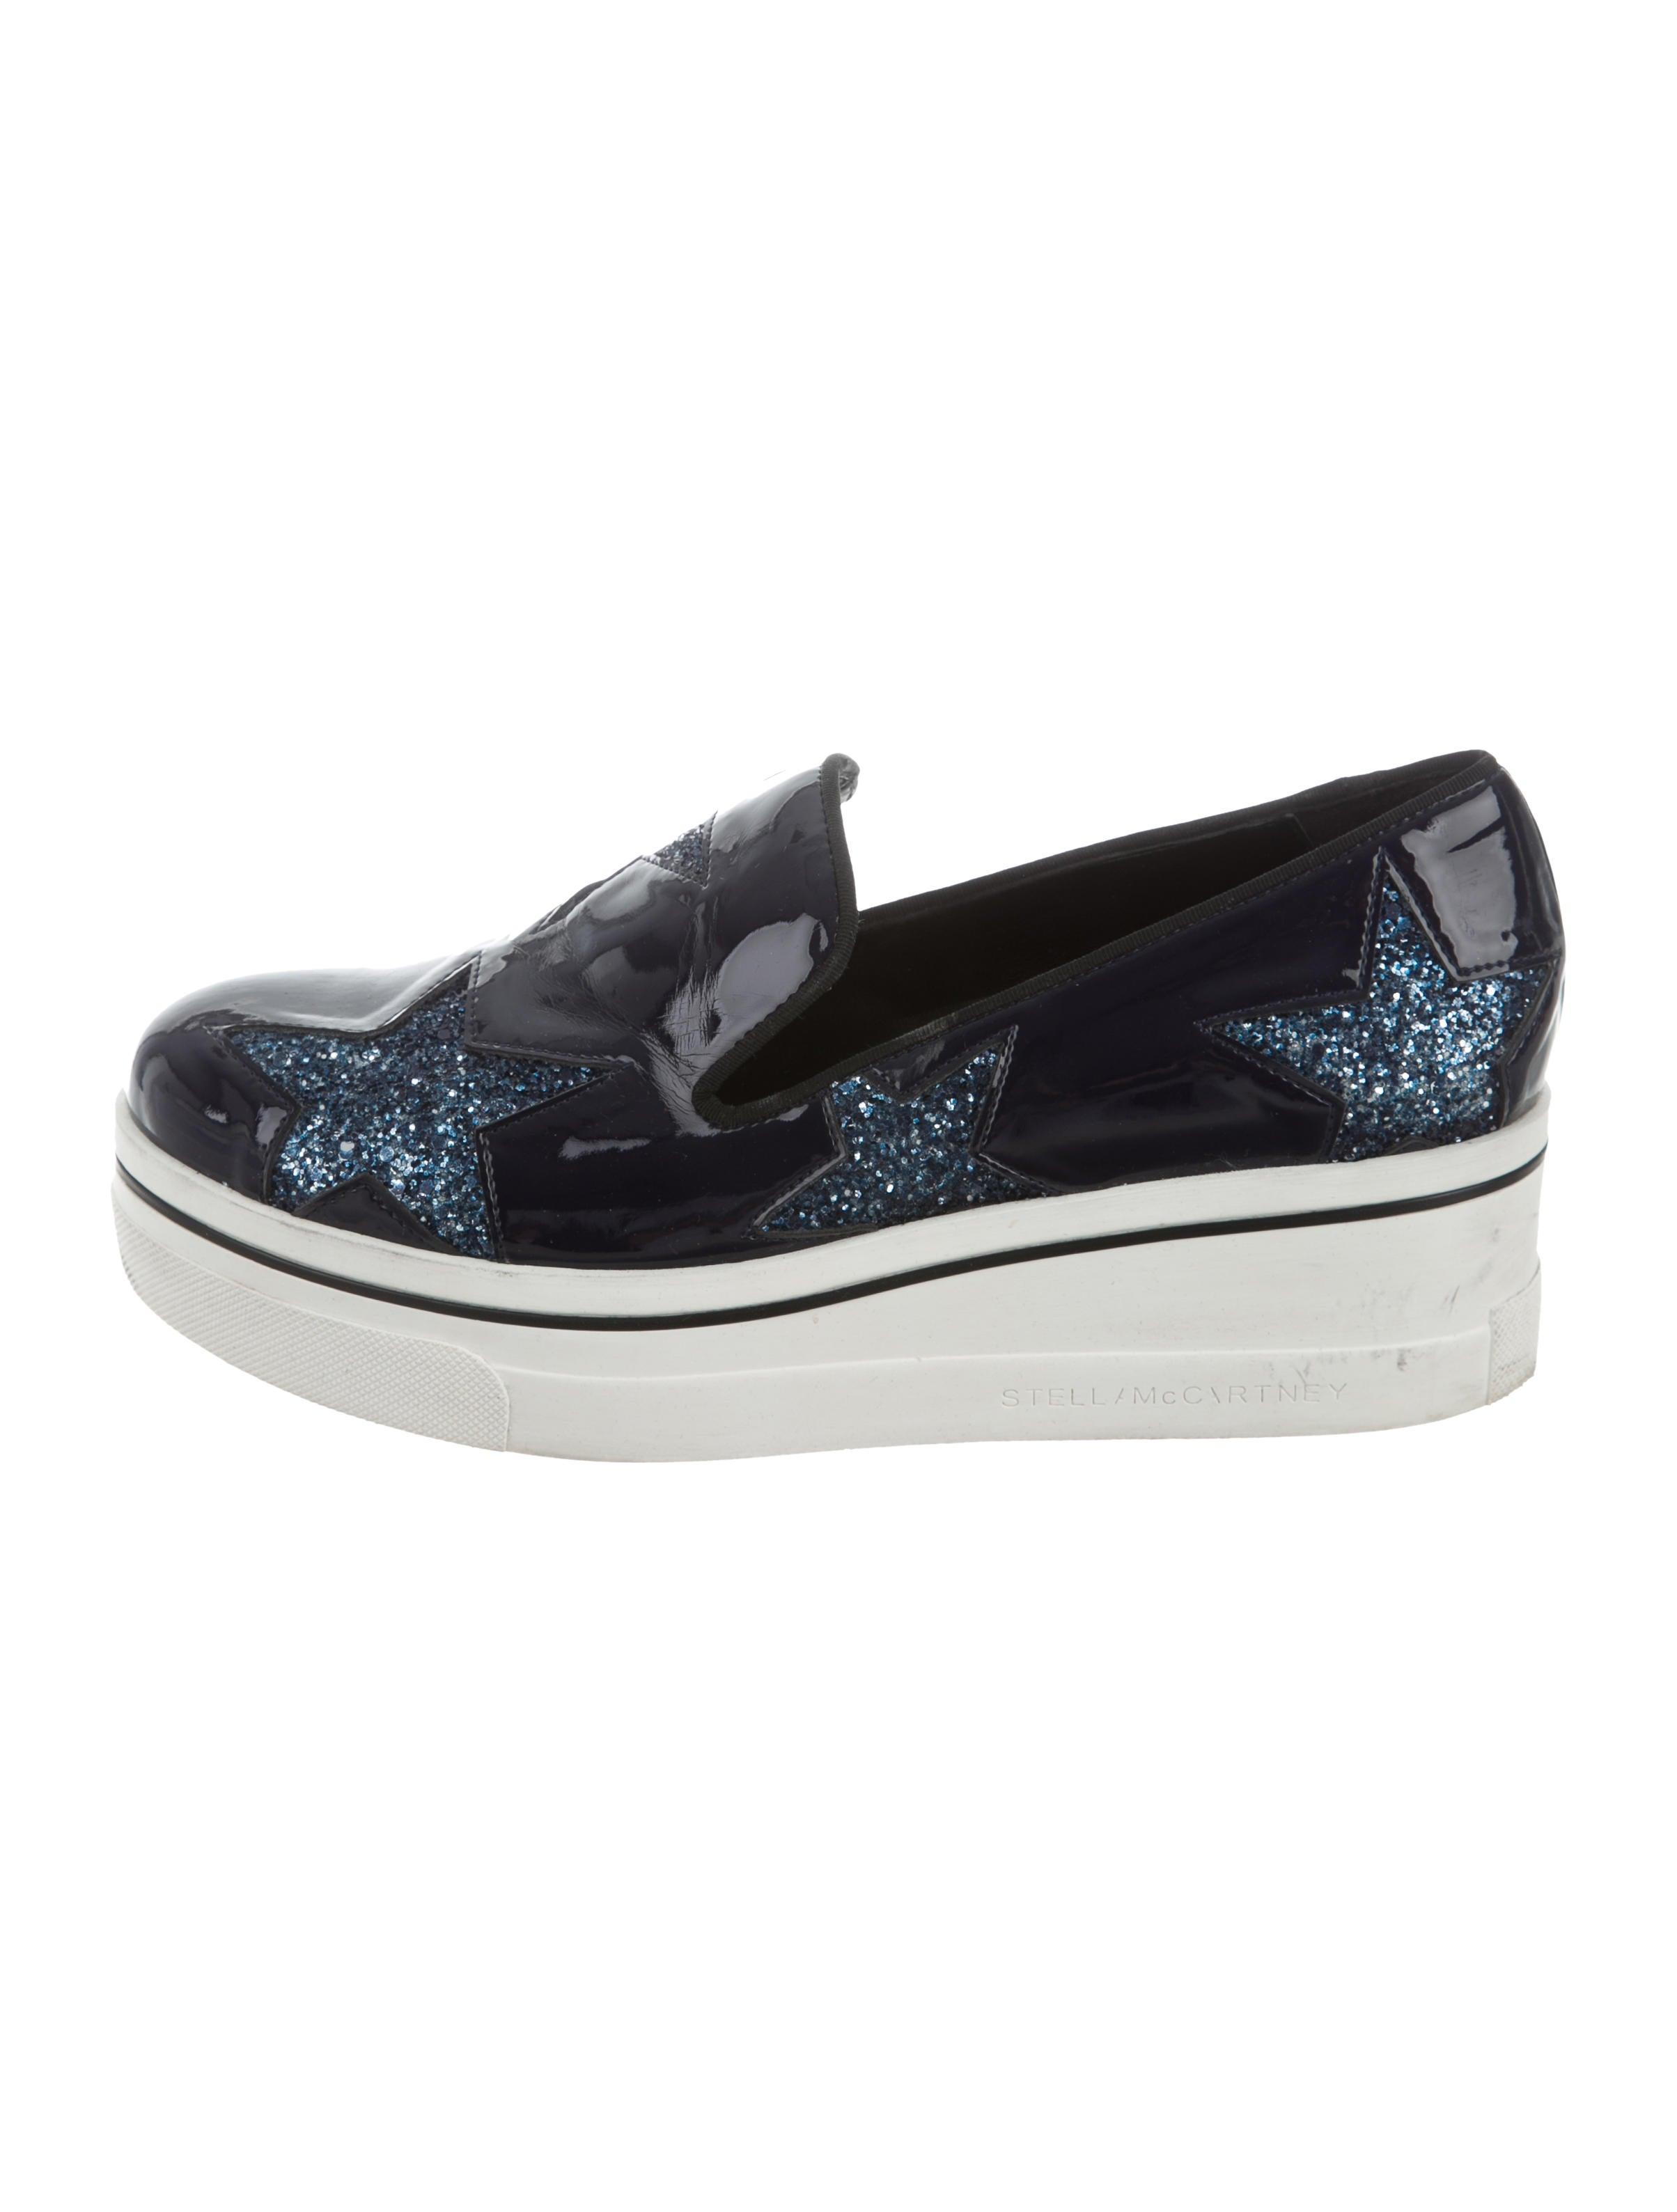 stella mccartney platform slip on sneakers shoes